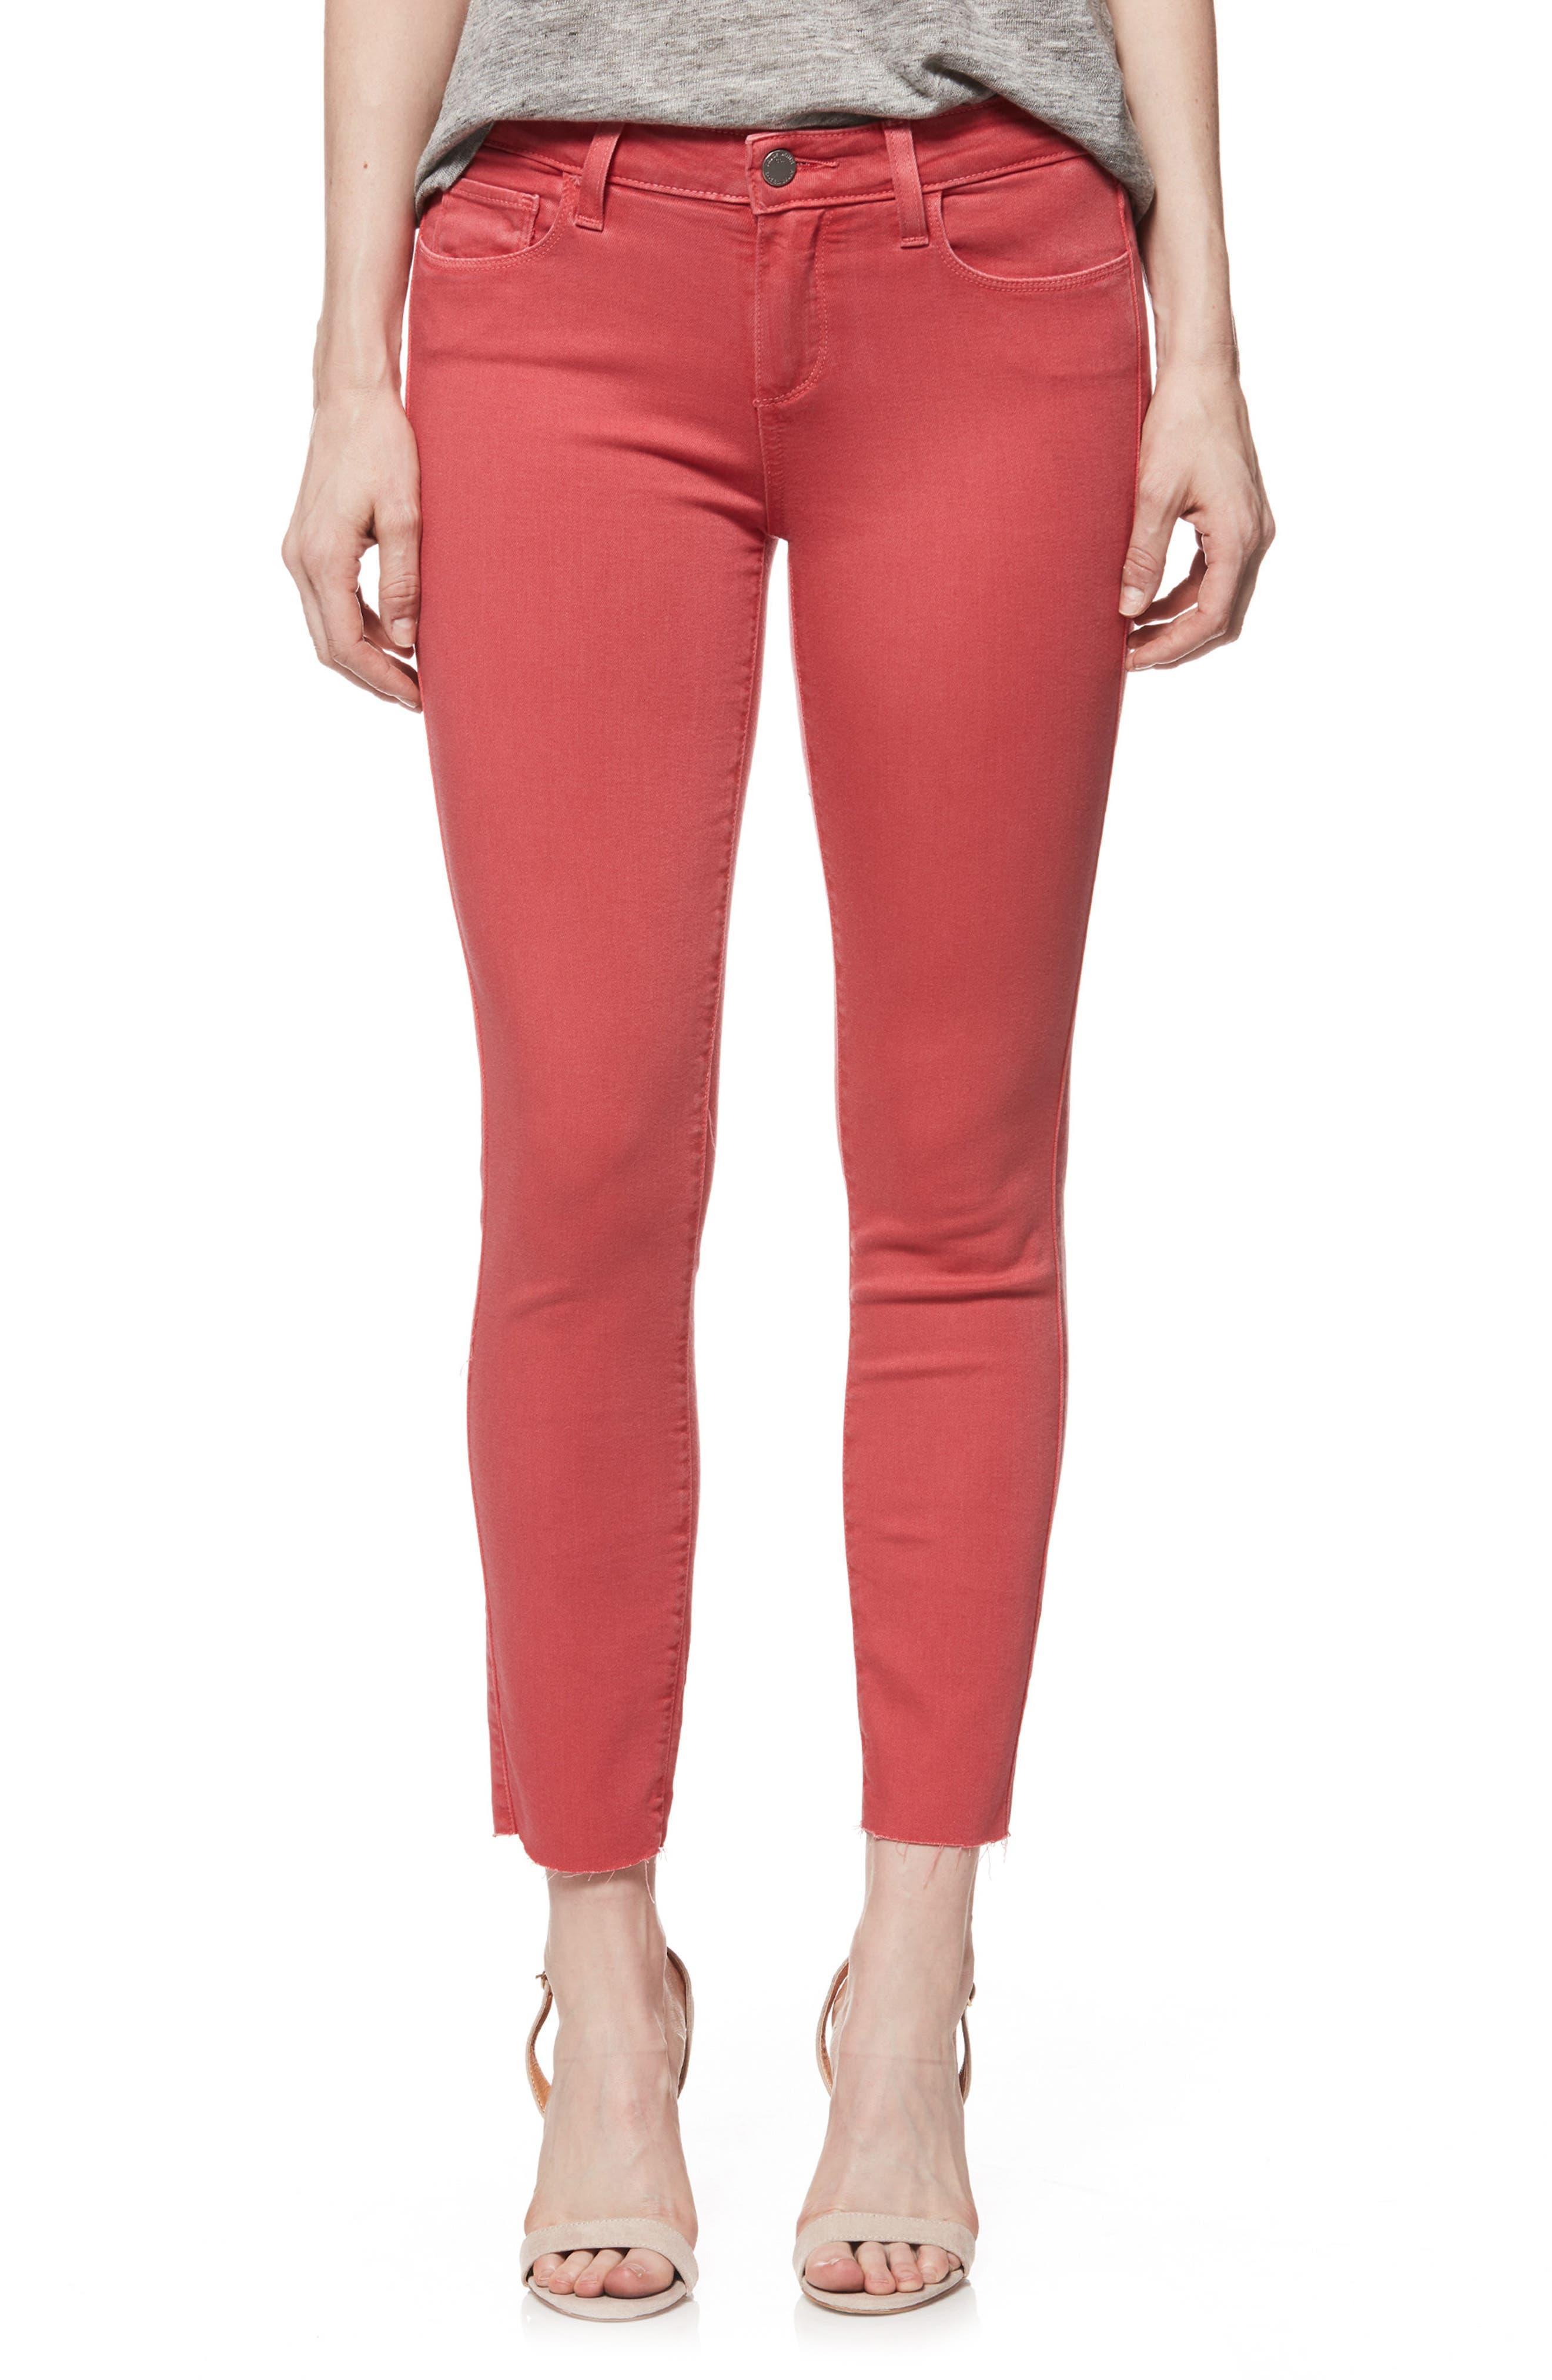 Transcend - Verdugo Raw Hem Crop Skinny Jeans,                         Main,                         color, 601